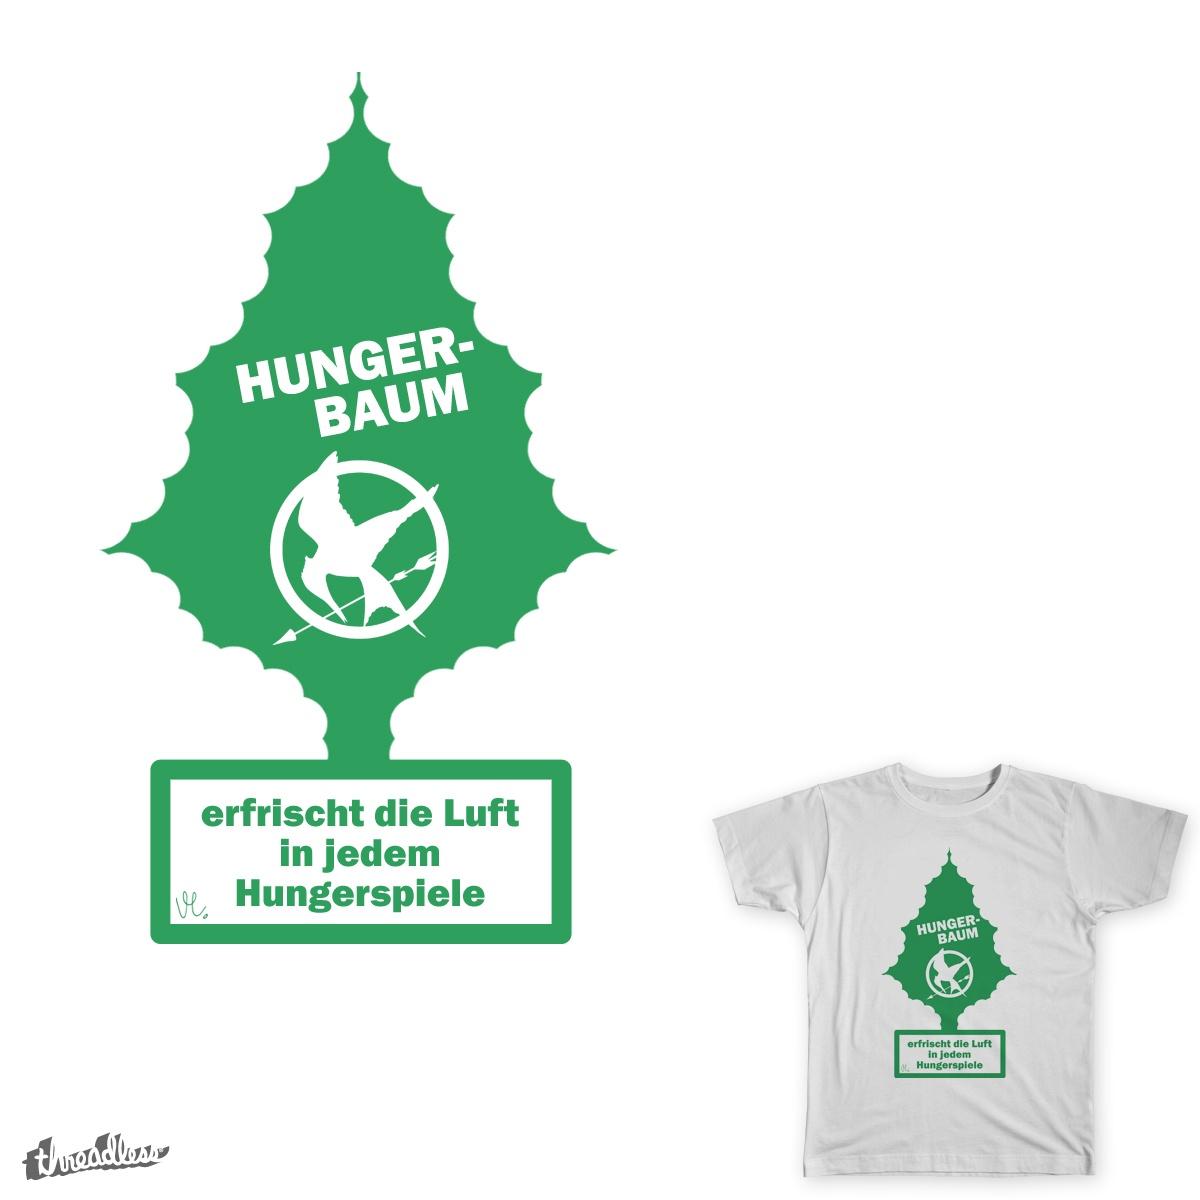 Hunger-Baum by Insane-kismanO on Threadless